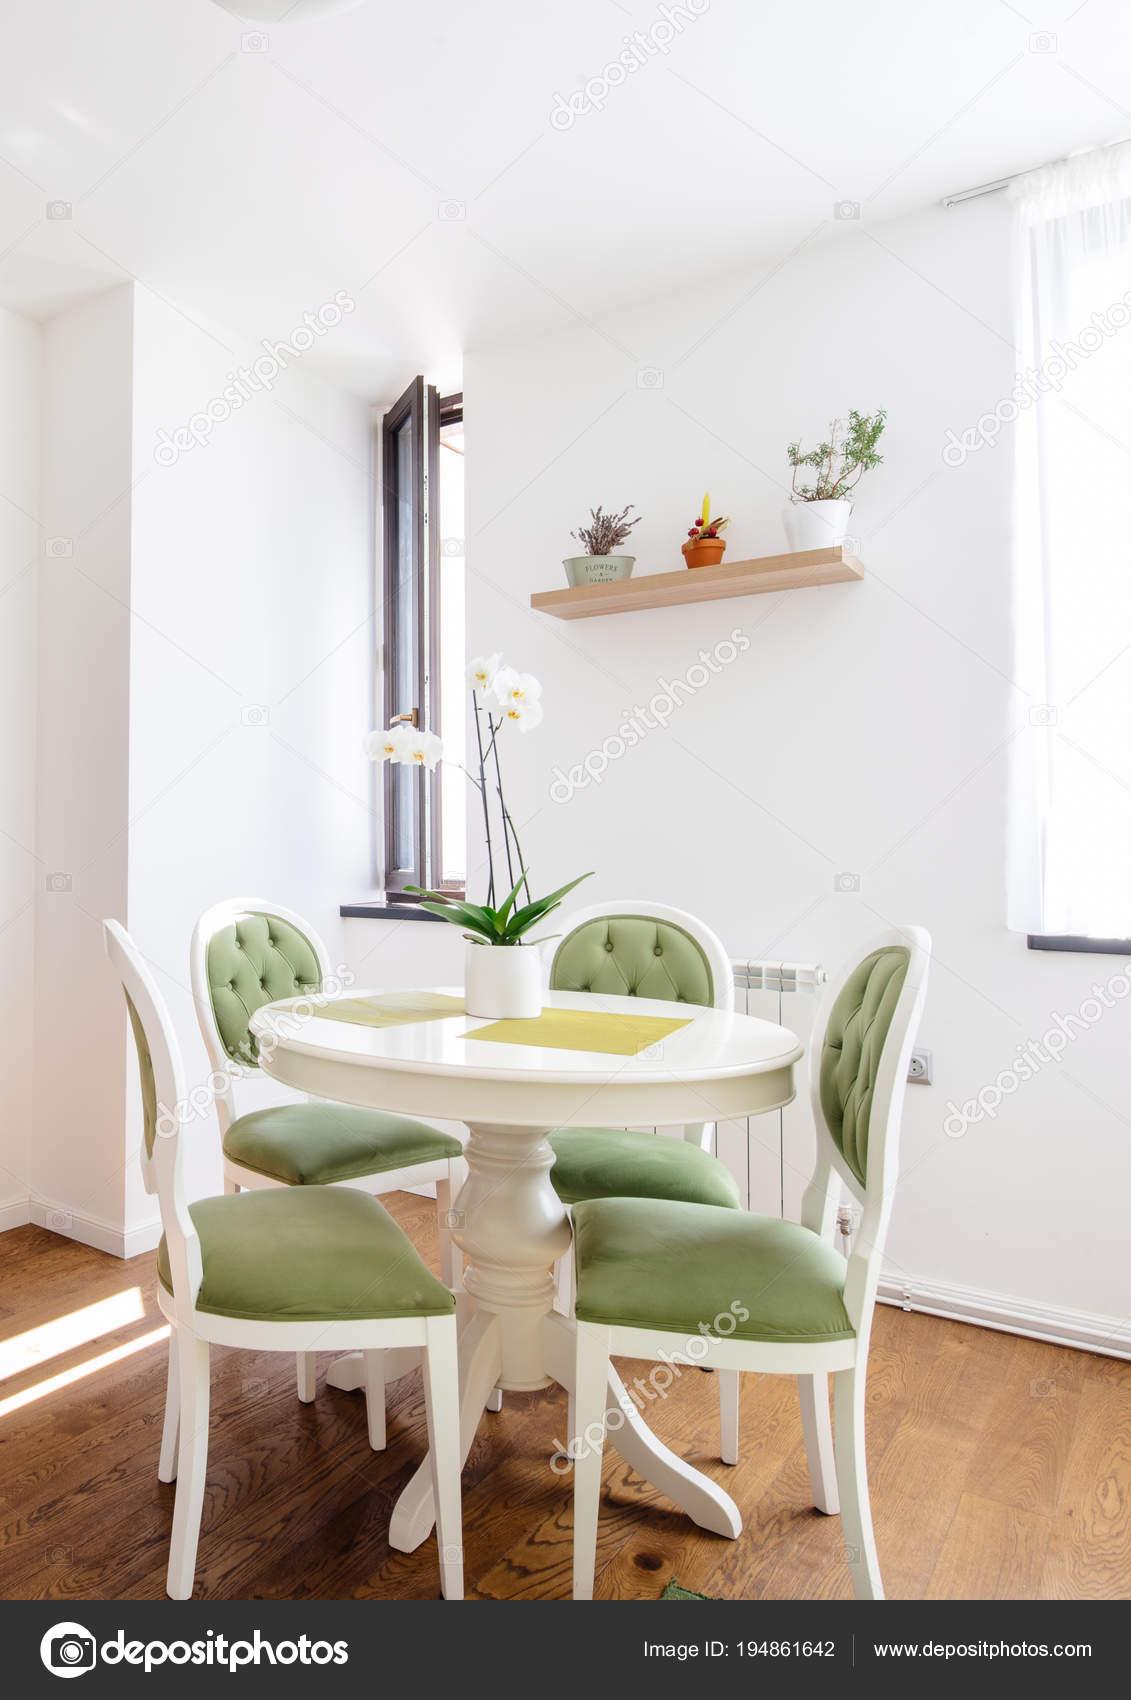 Moderne Keukentafels En Stoelen.Moderne Keukentafel Met Eetkamer Stoelen En Houten Vloer Hardhouten